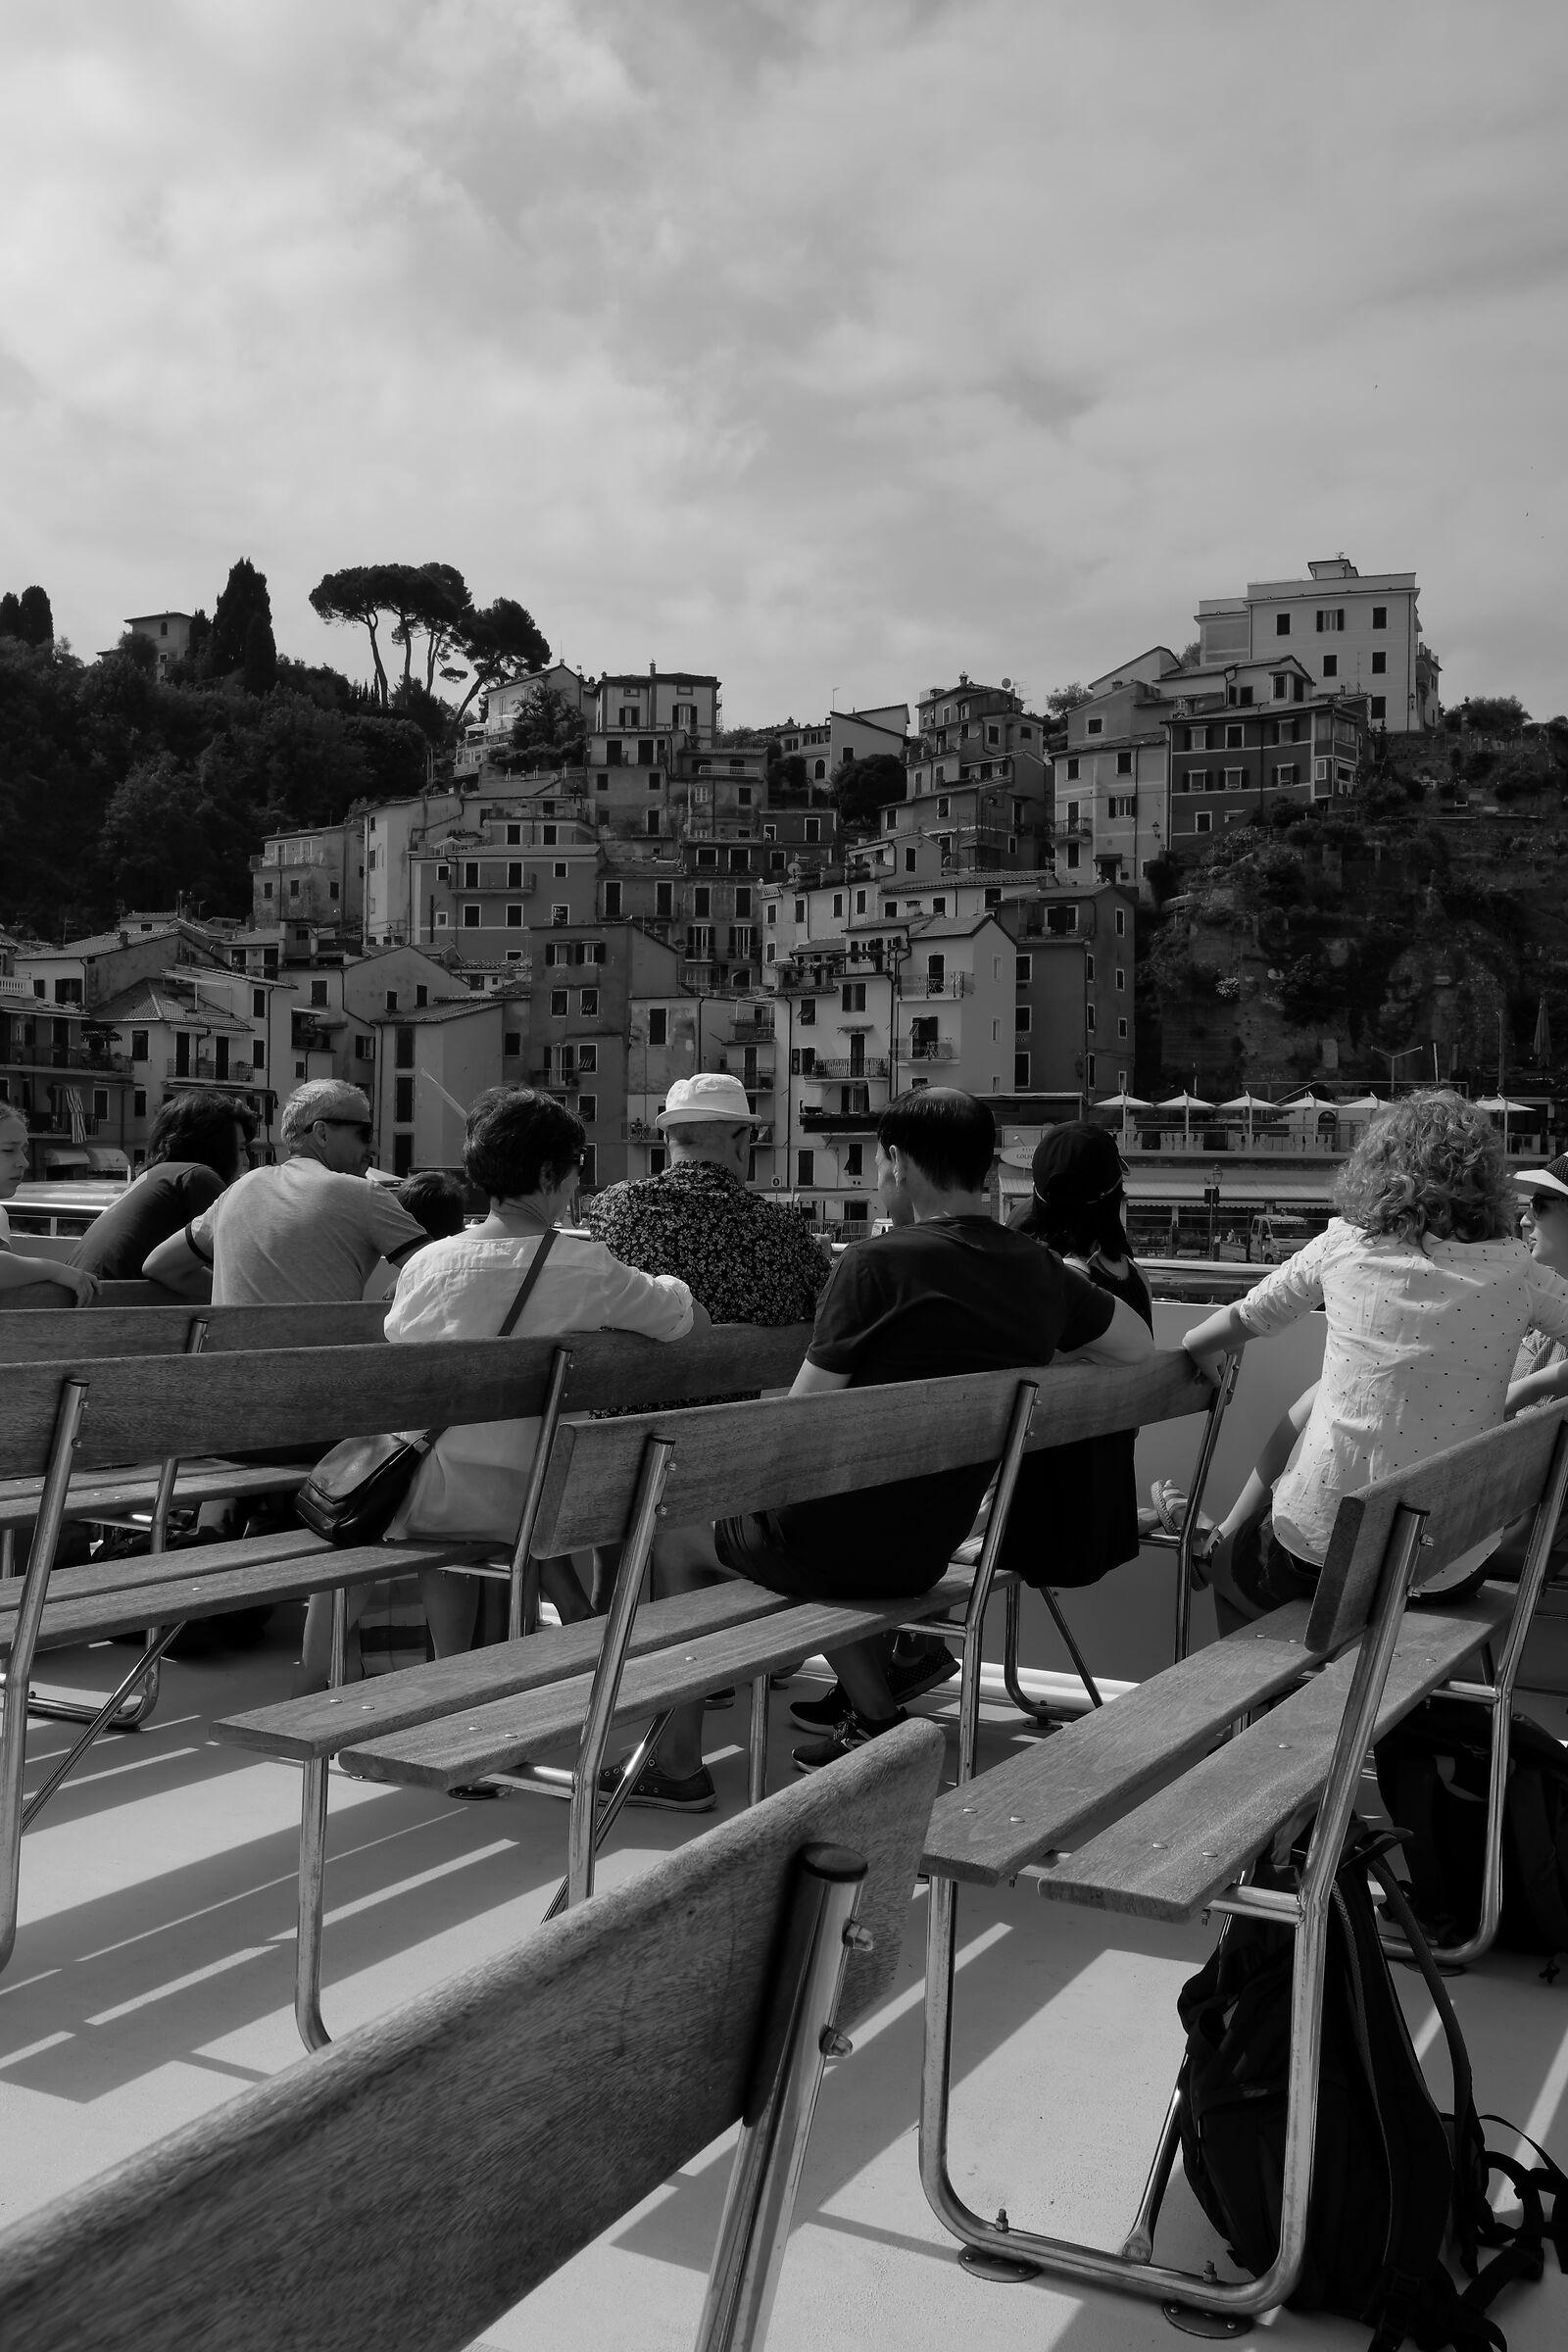 Turisti...all'opera...